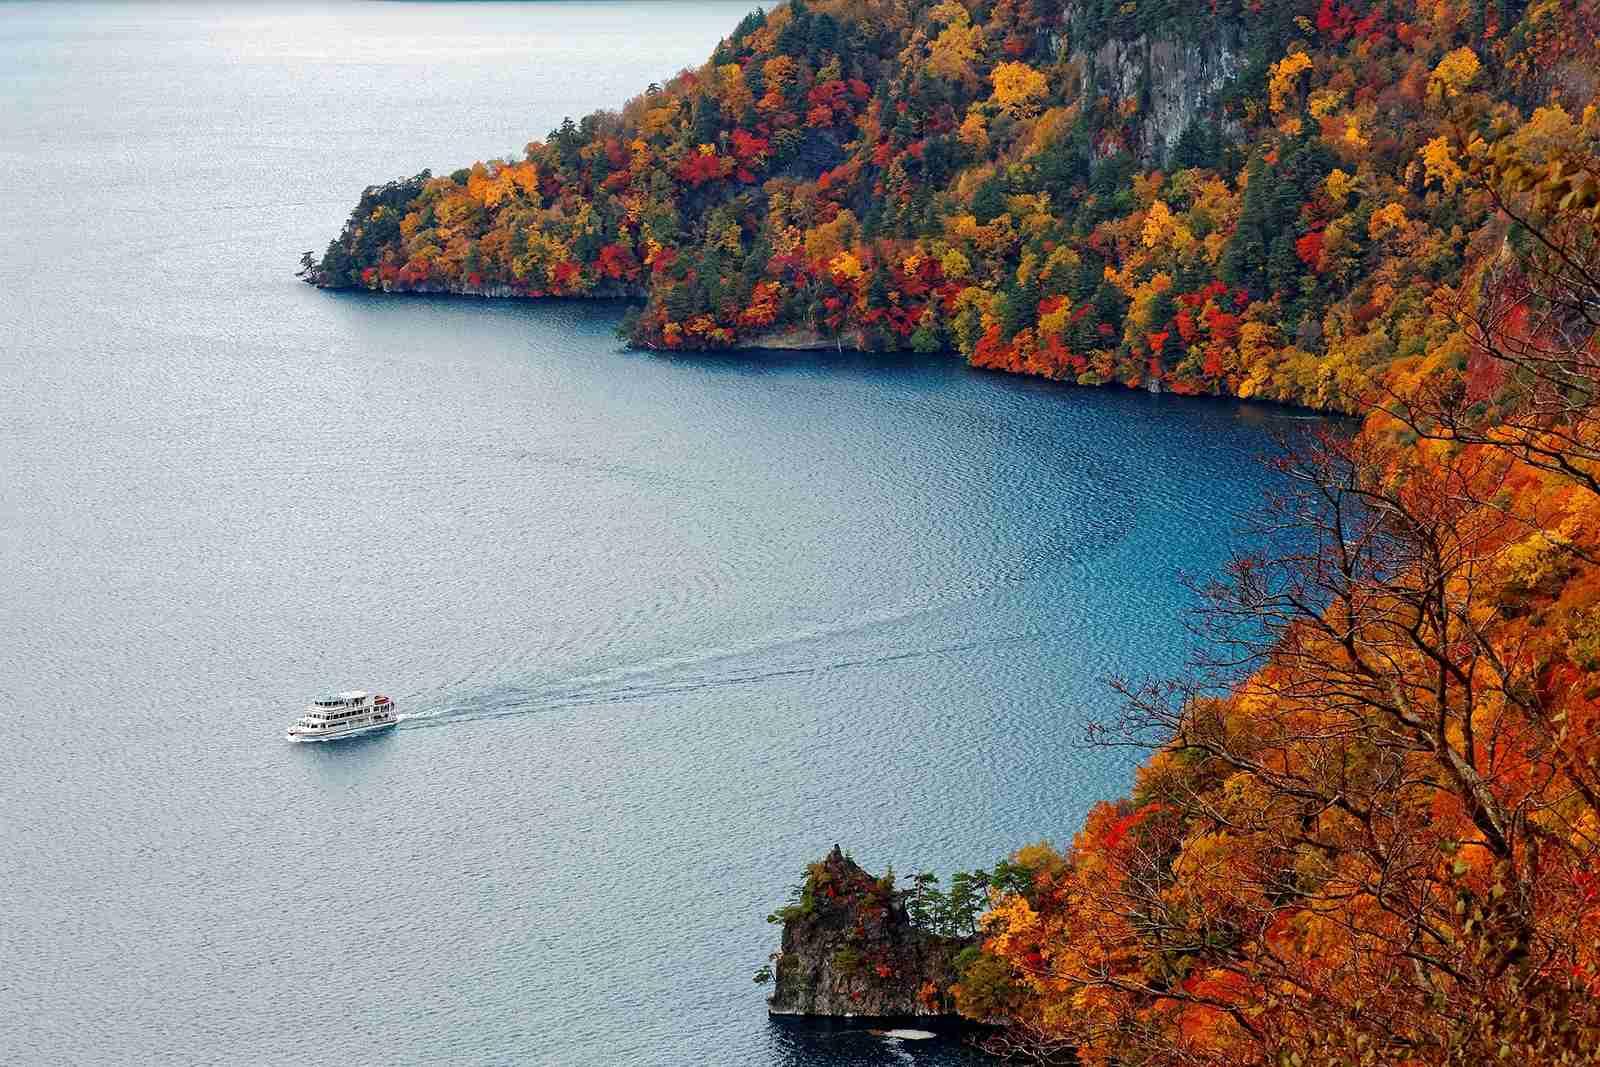 A cruise enjoying the beautiful fall foliage. (Photo by Shutterstock)